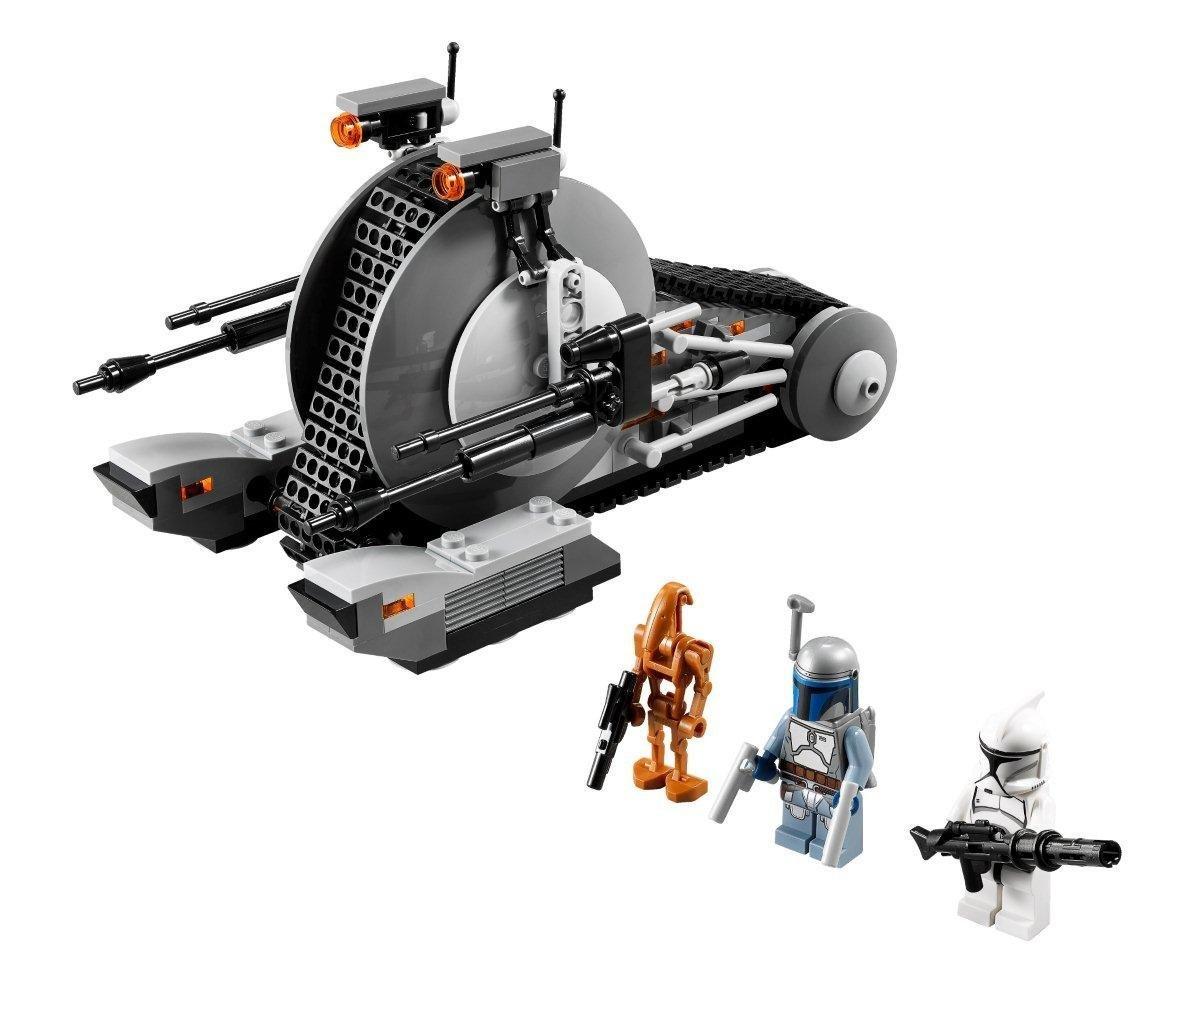 Lego Star Wars 75015 Corporate Alliance Tank Droid Amazon